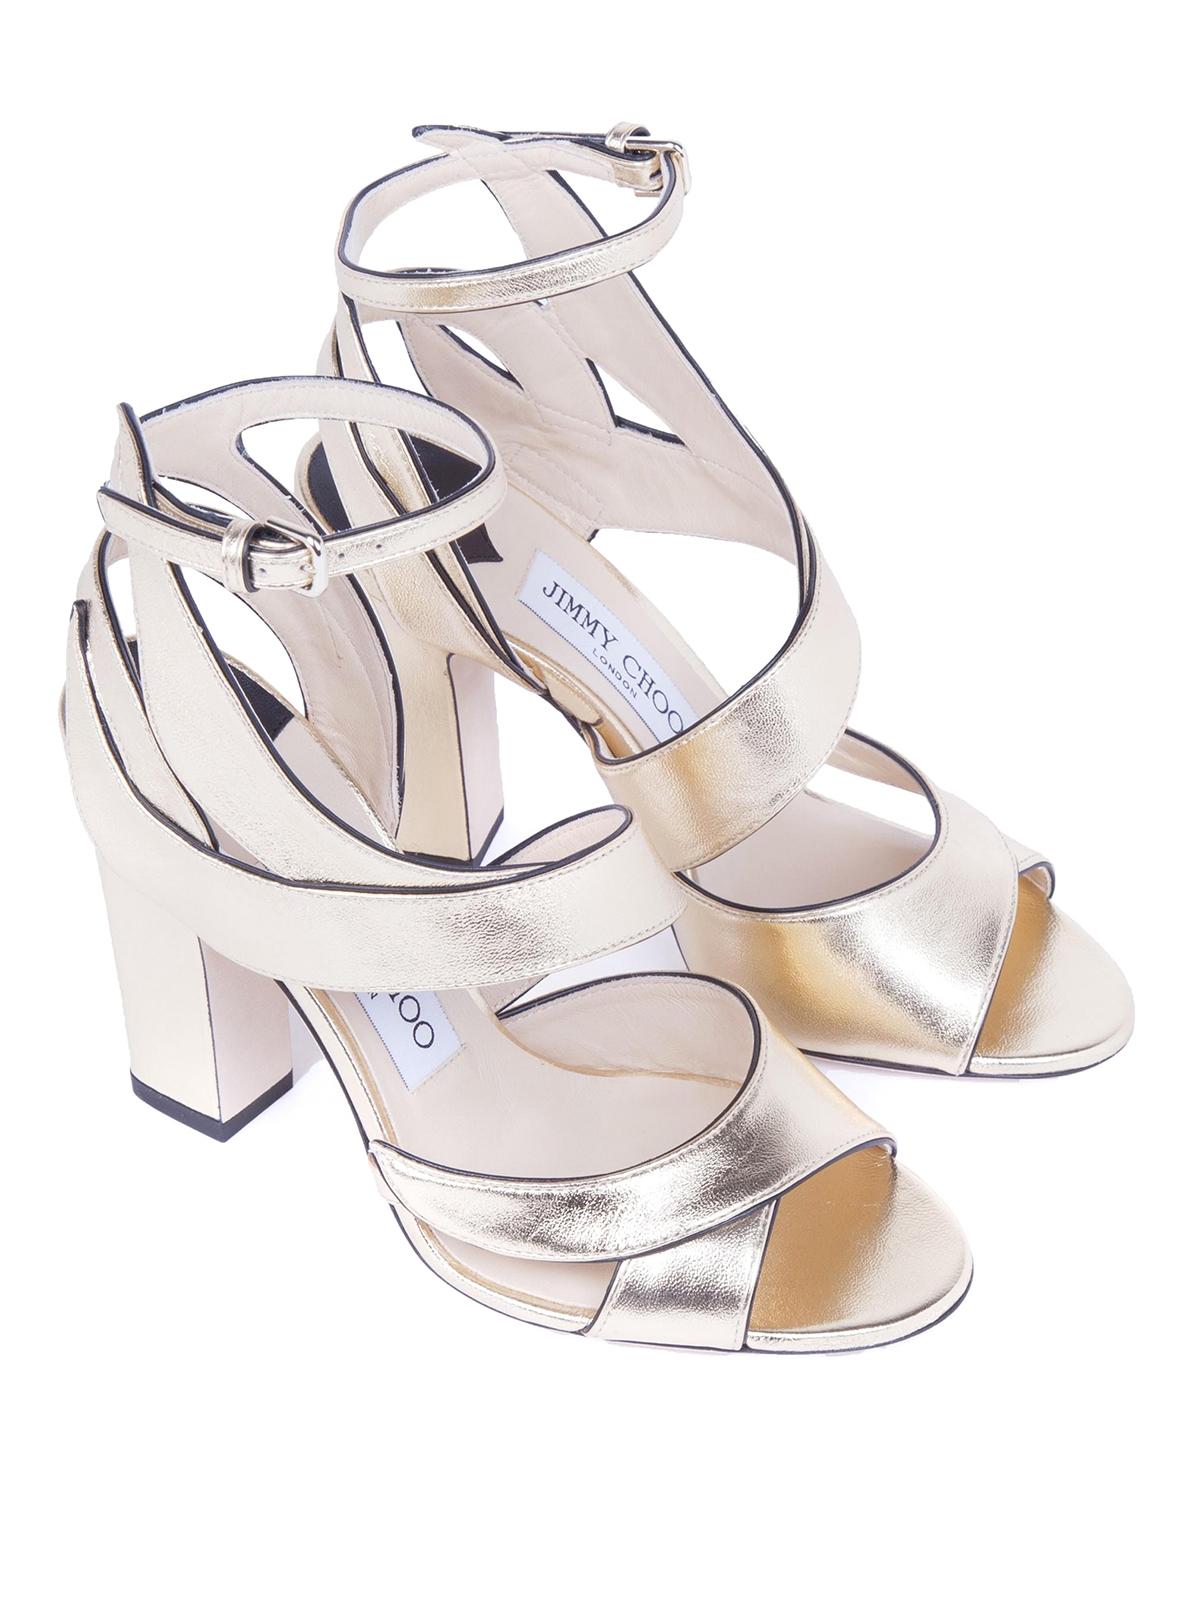 1217b765595 JIMMY CHOO  sandals online - Falcon 100 mirror leather sandals